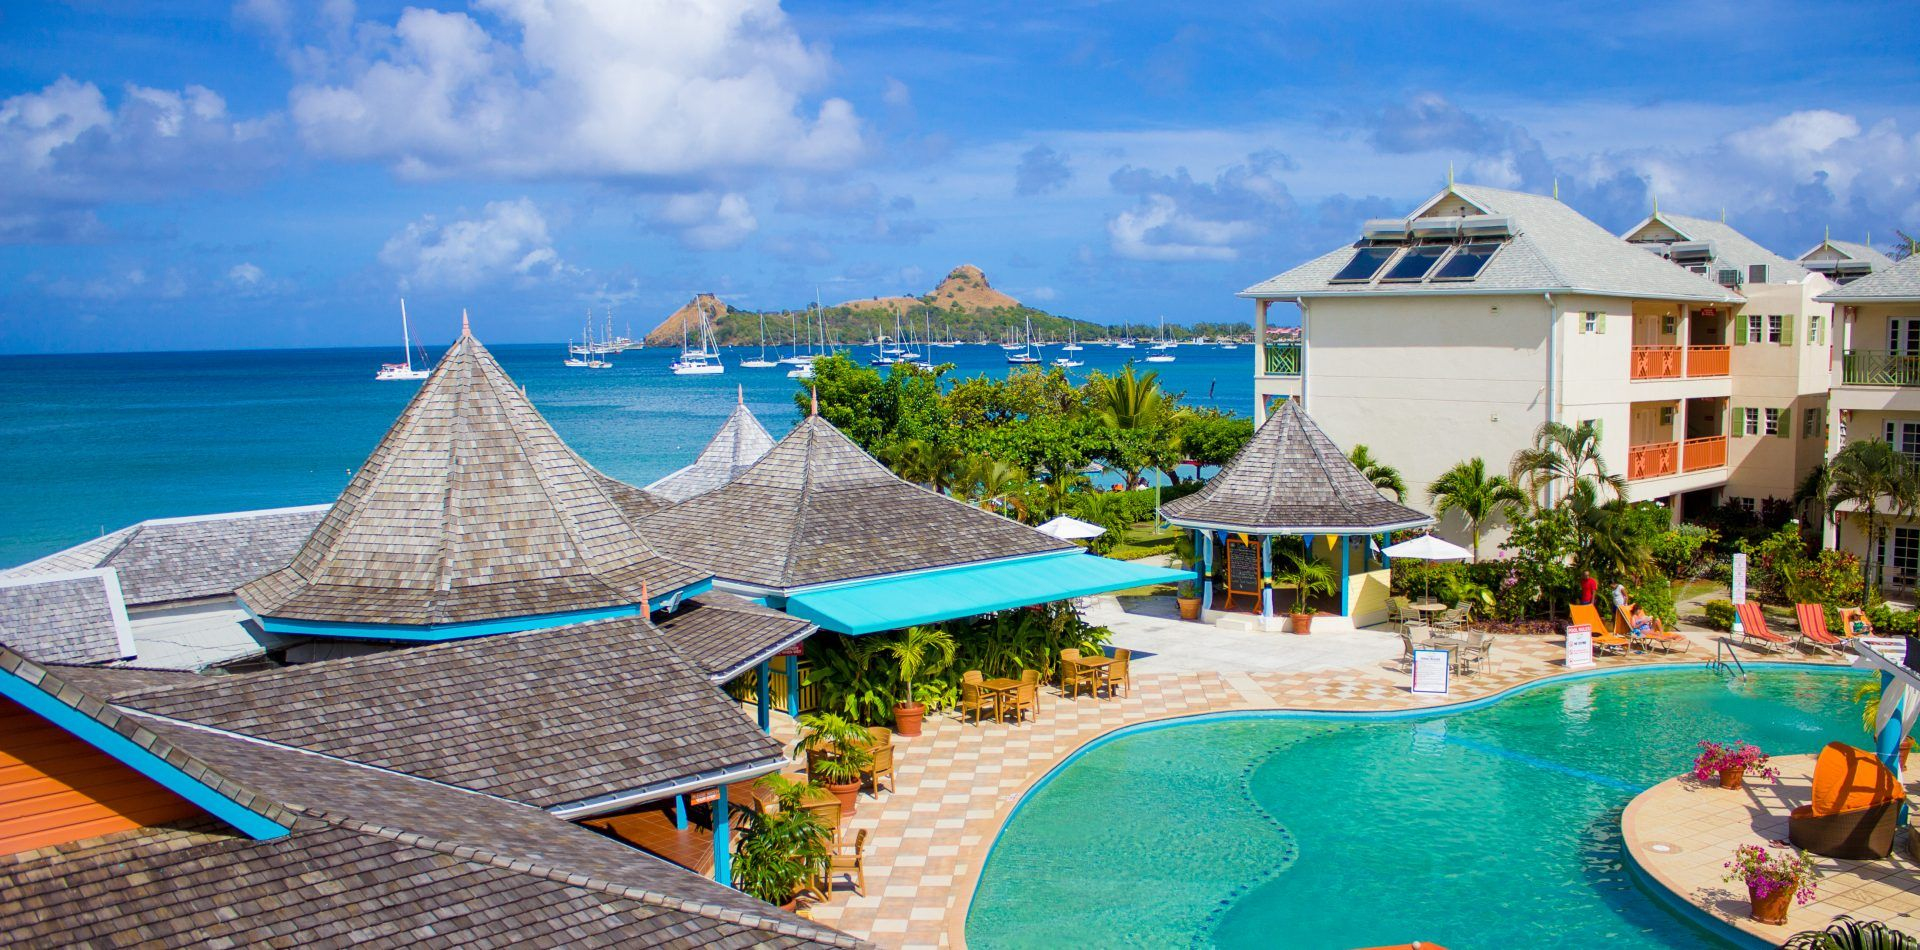 2d92273745f832c2731c4e6abaa1b0dd - Tripadvisor Bay Gardens Beach Resort St Lucia